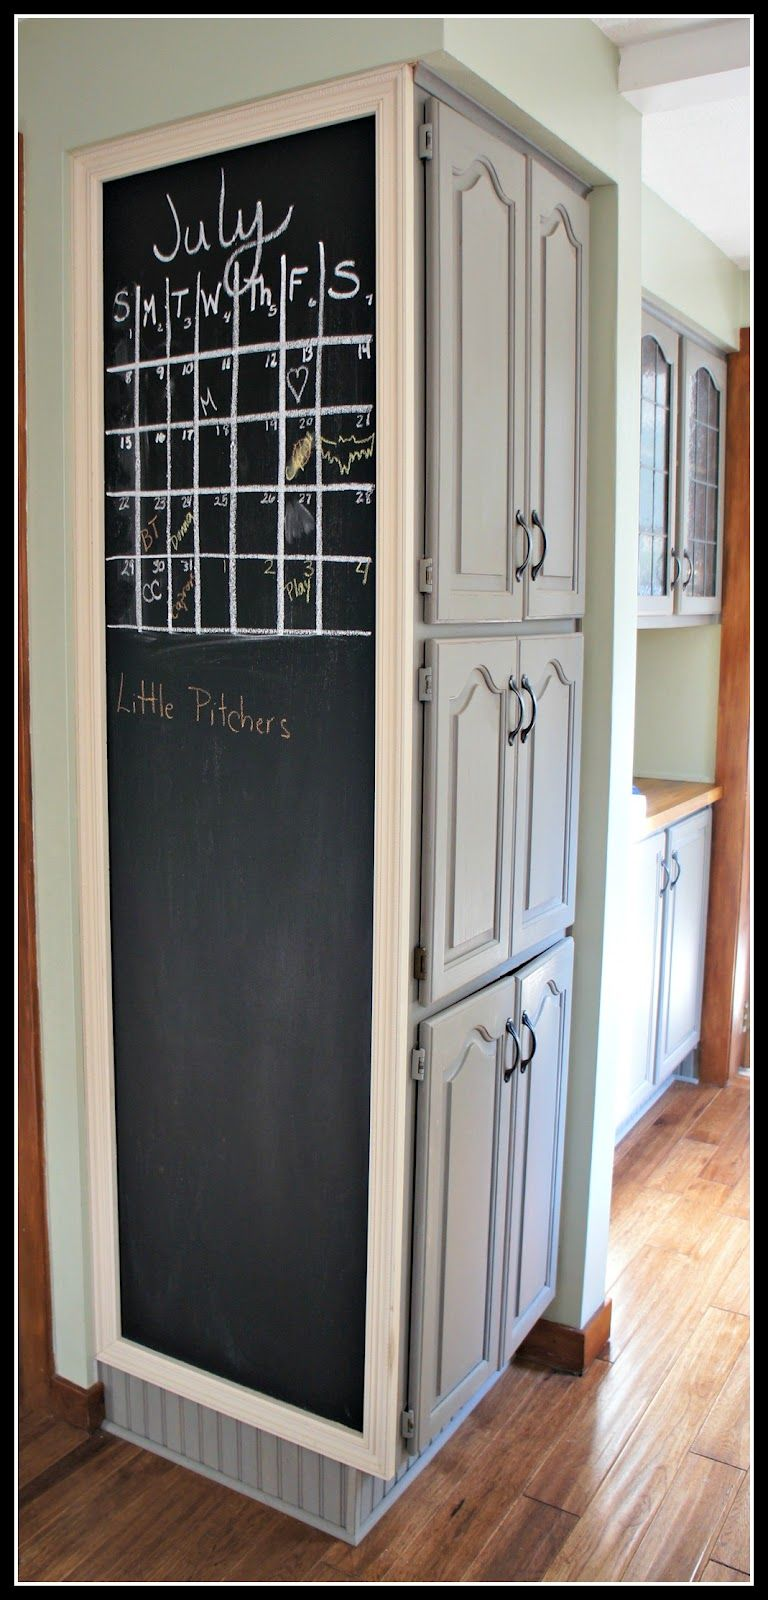 Elegant Kitchen Chalkboard Calendar   Could Work On A Fridge